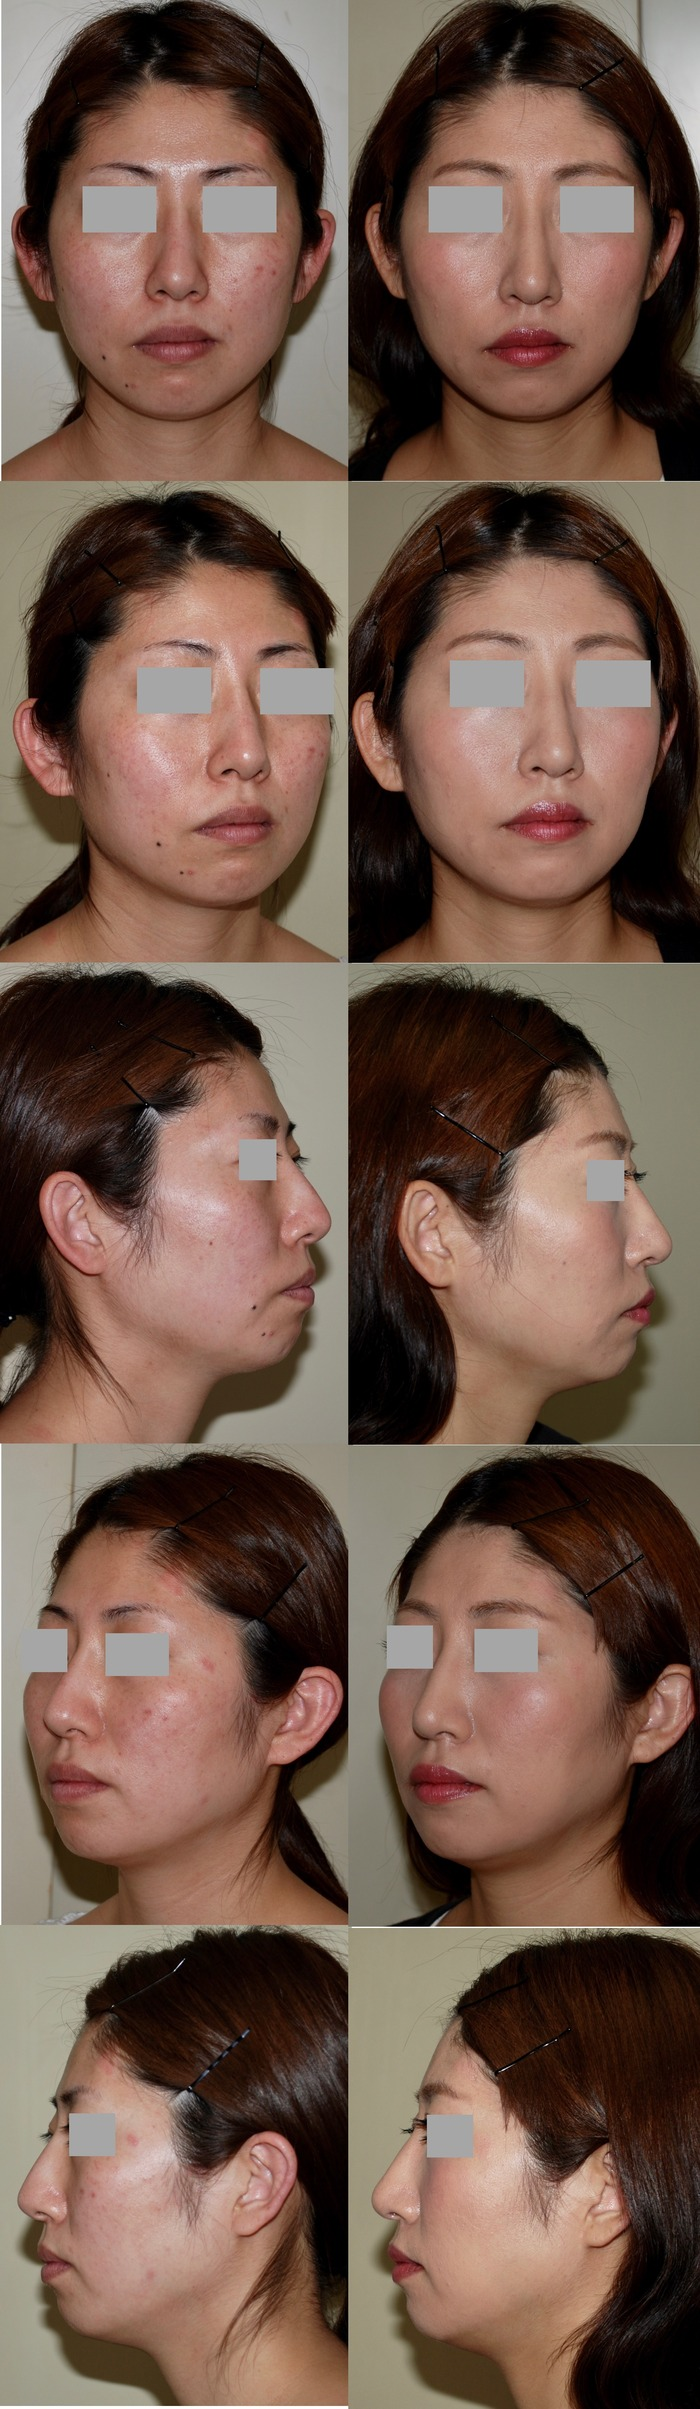 他院鼻プロテーゼ抜去・鼻骨骨切り術・鼻中隔延長術 術後3ヶ月